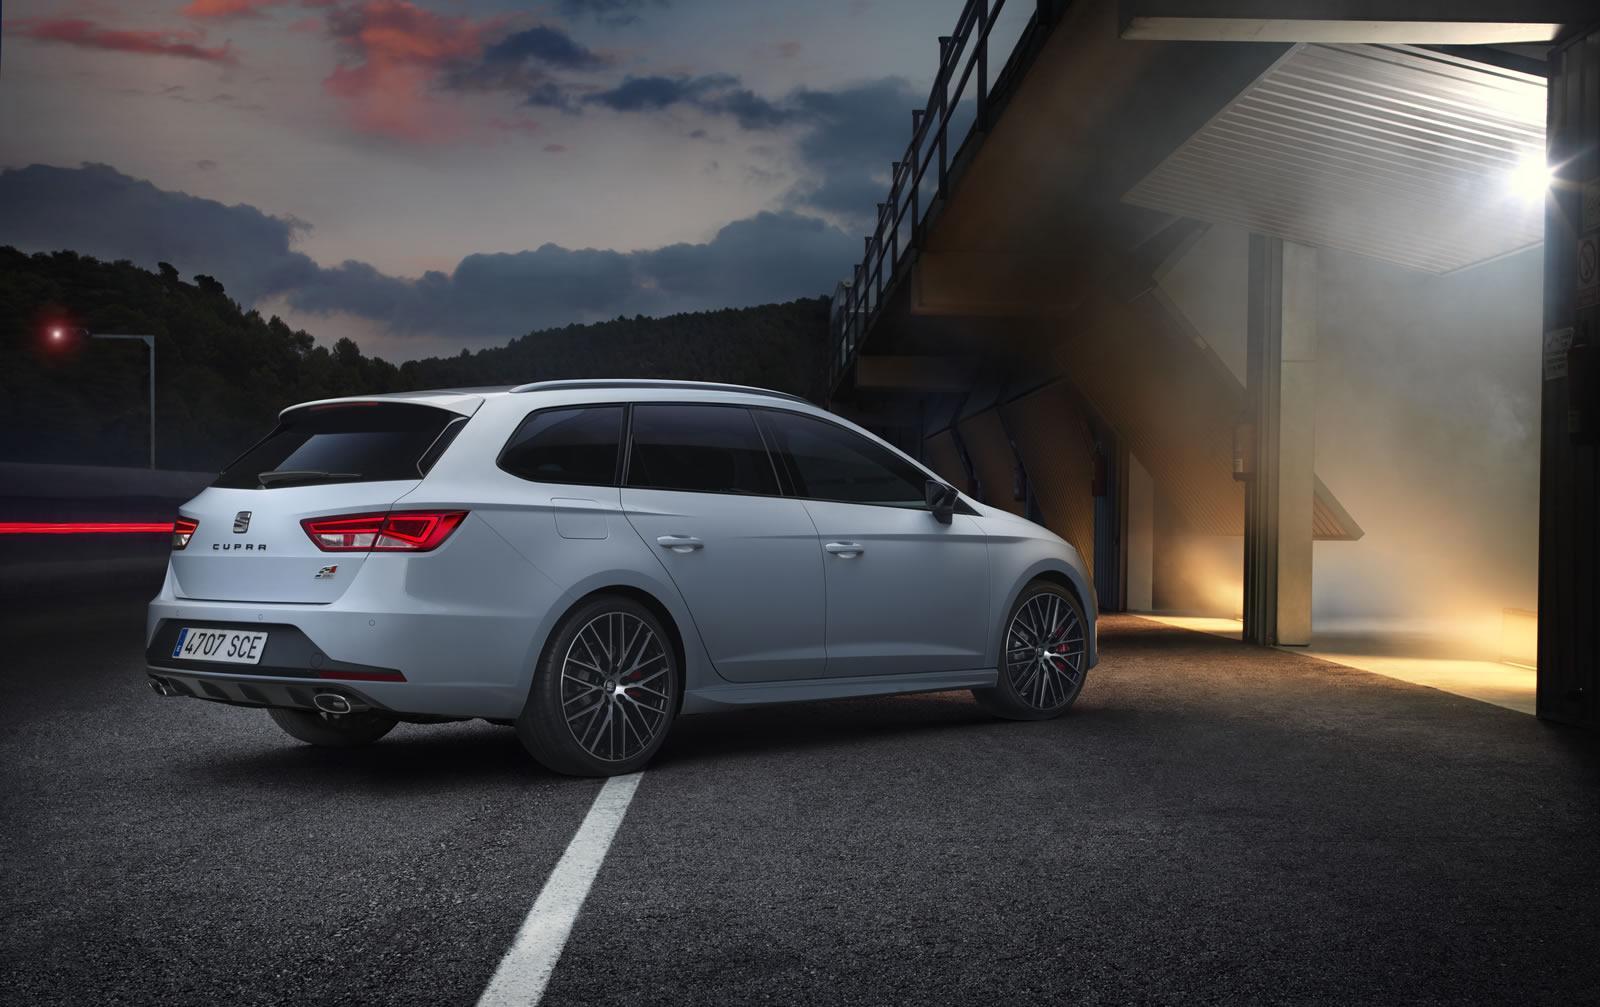 2015 seat leon st cupra revealed 280 hp hot estate autoevolution. Black Bedroom Furniture Sets. Home Design Ideas